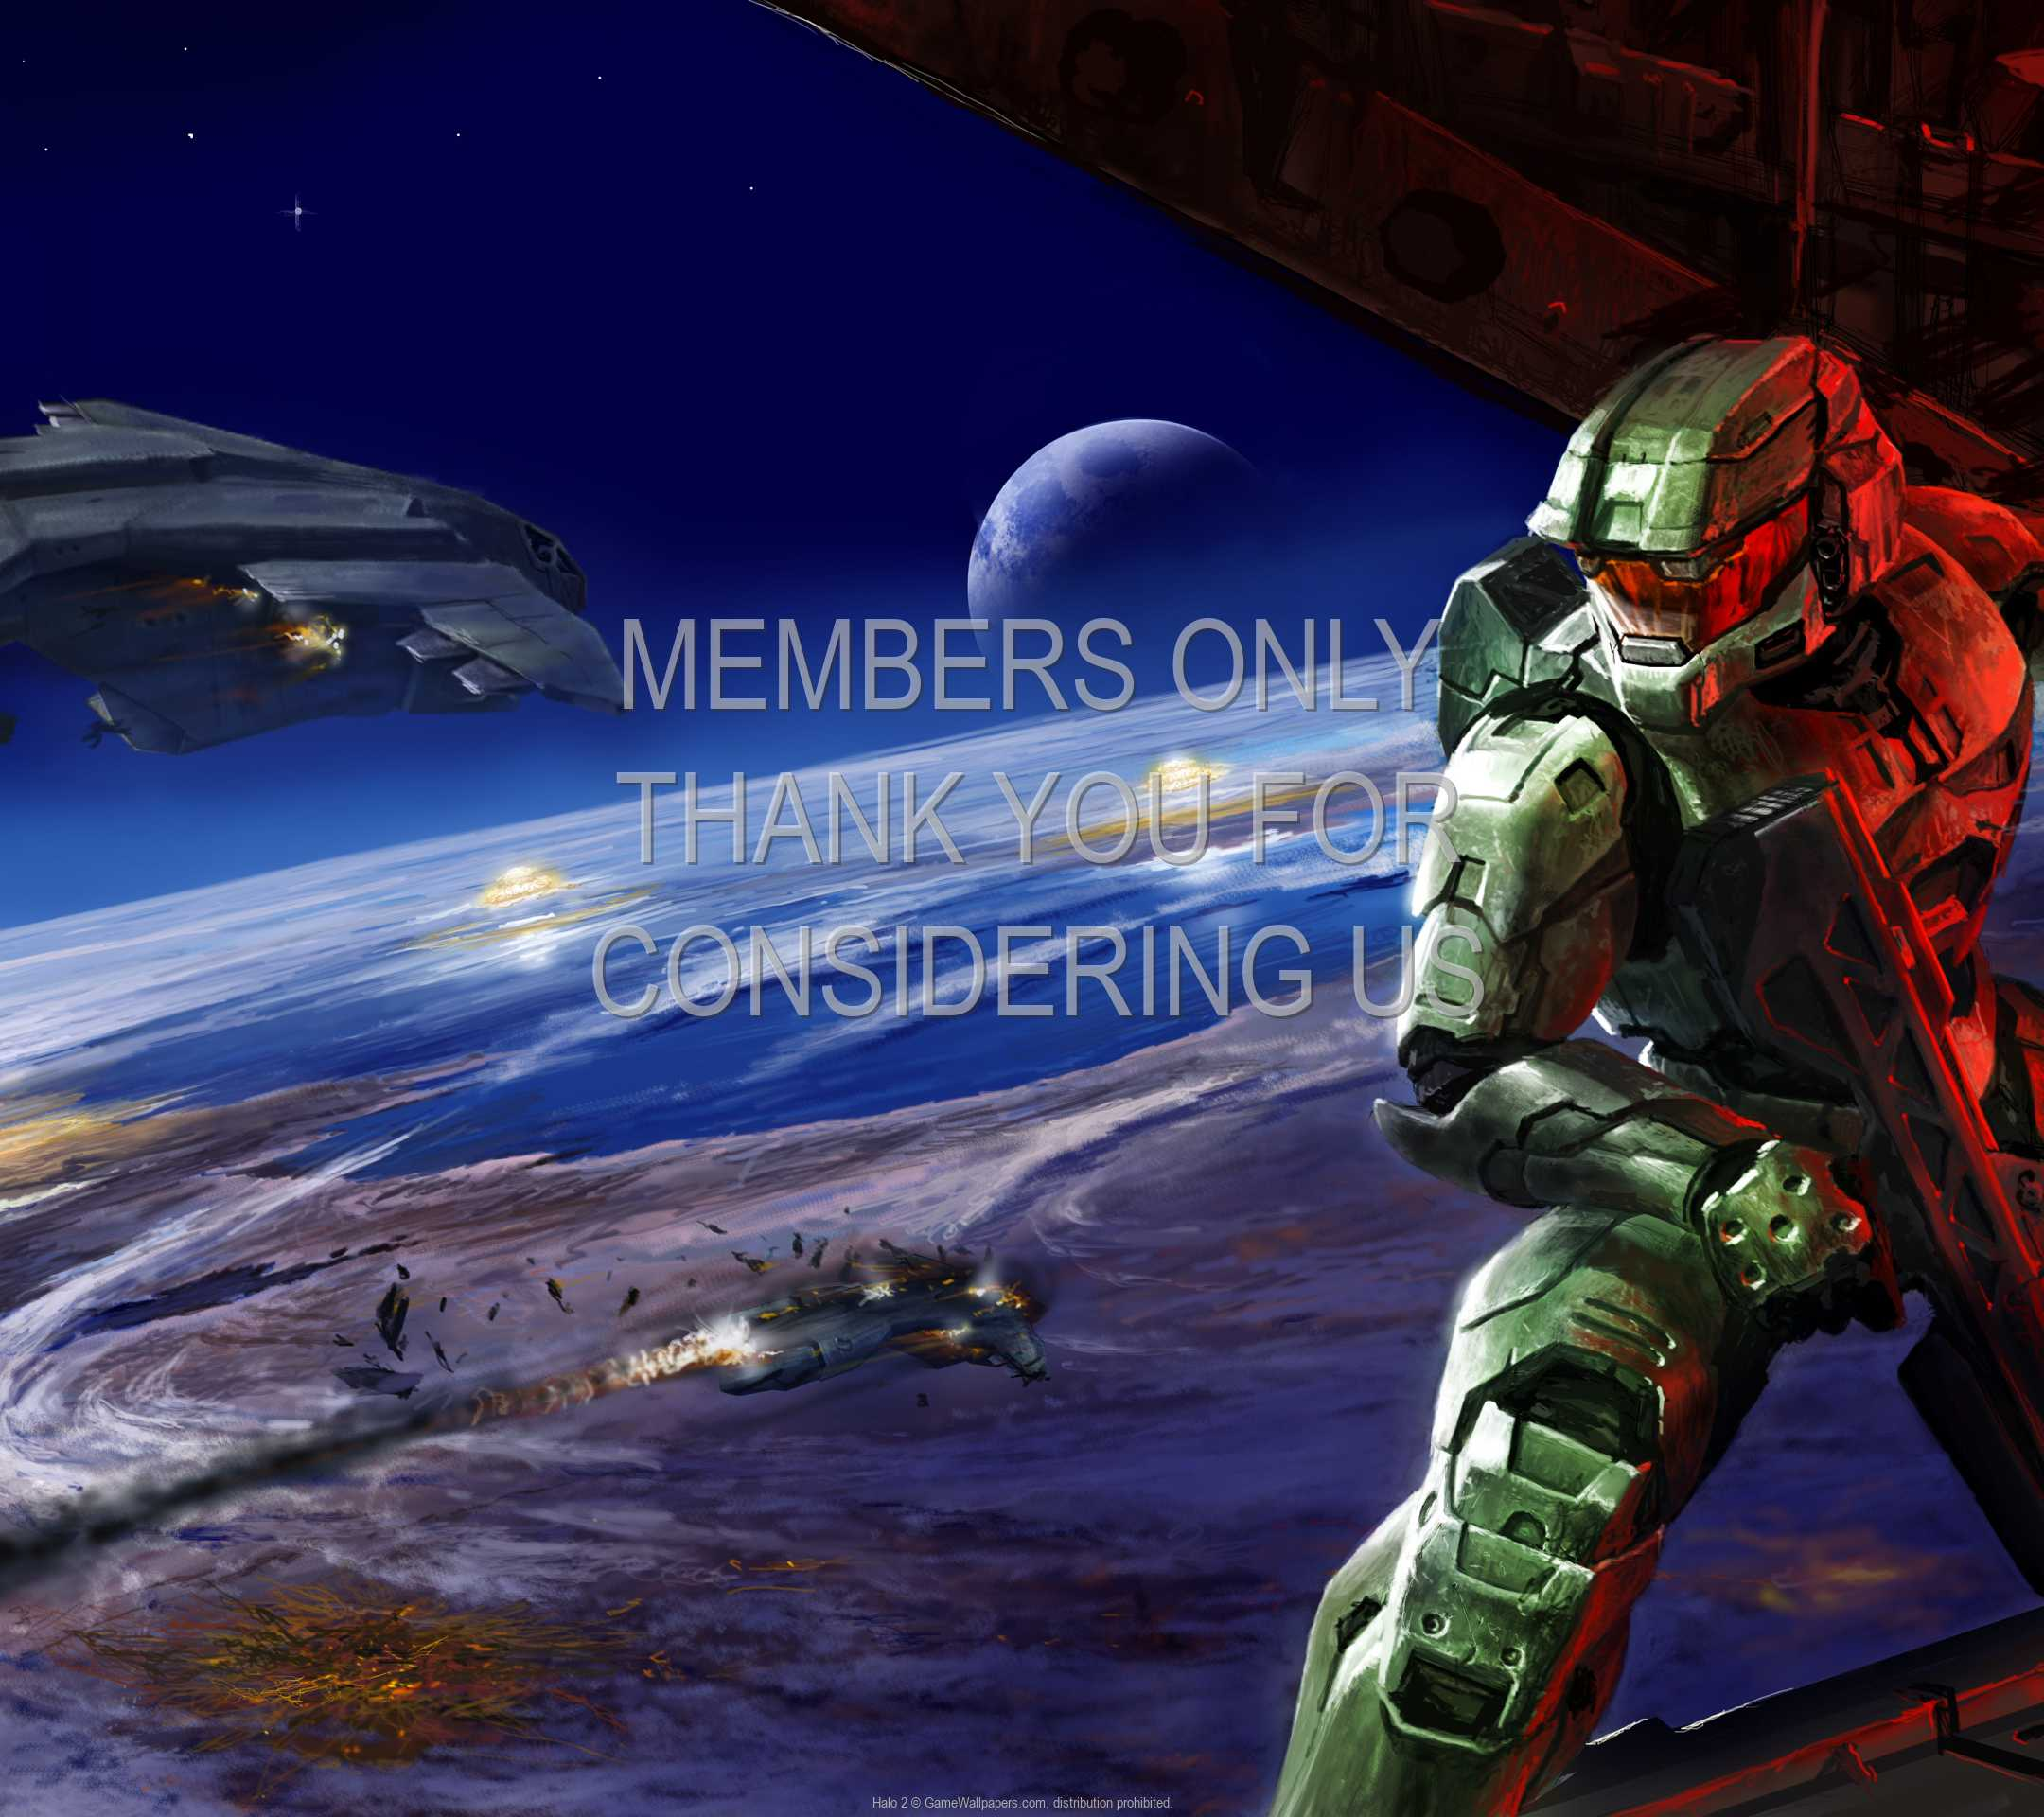 Halo 2 1080p Horizontal Mobile fond d'écran 18